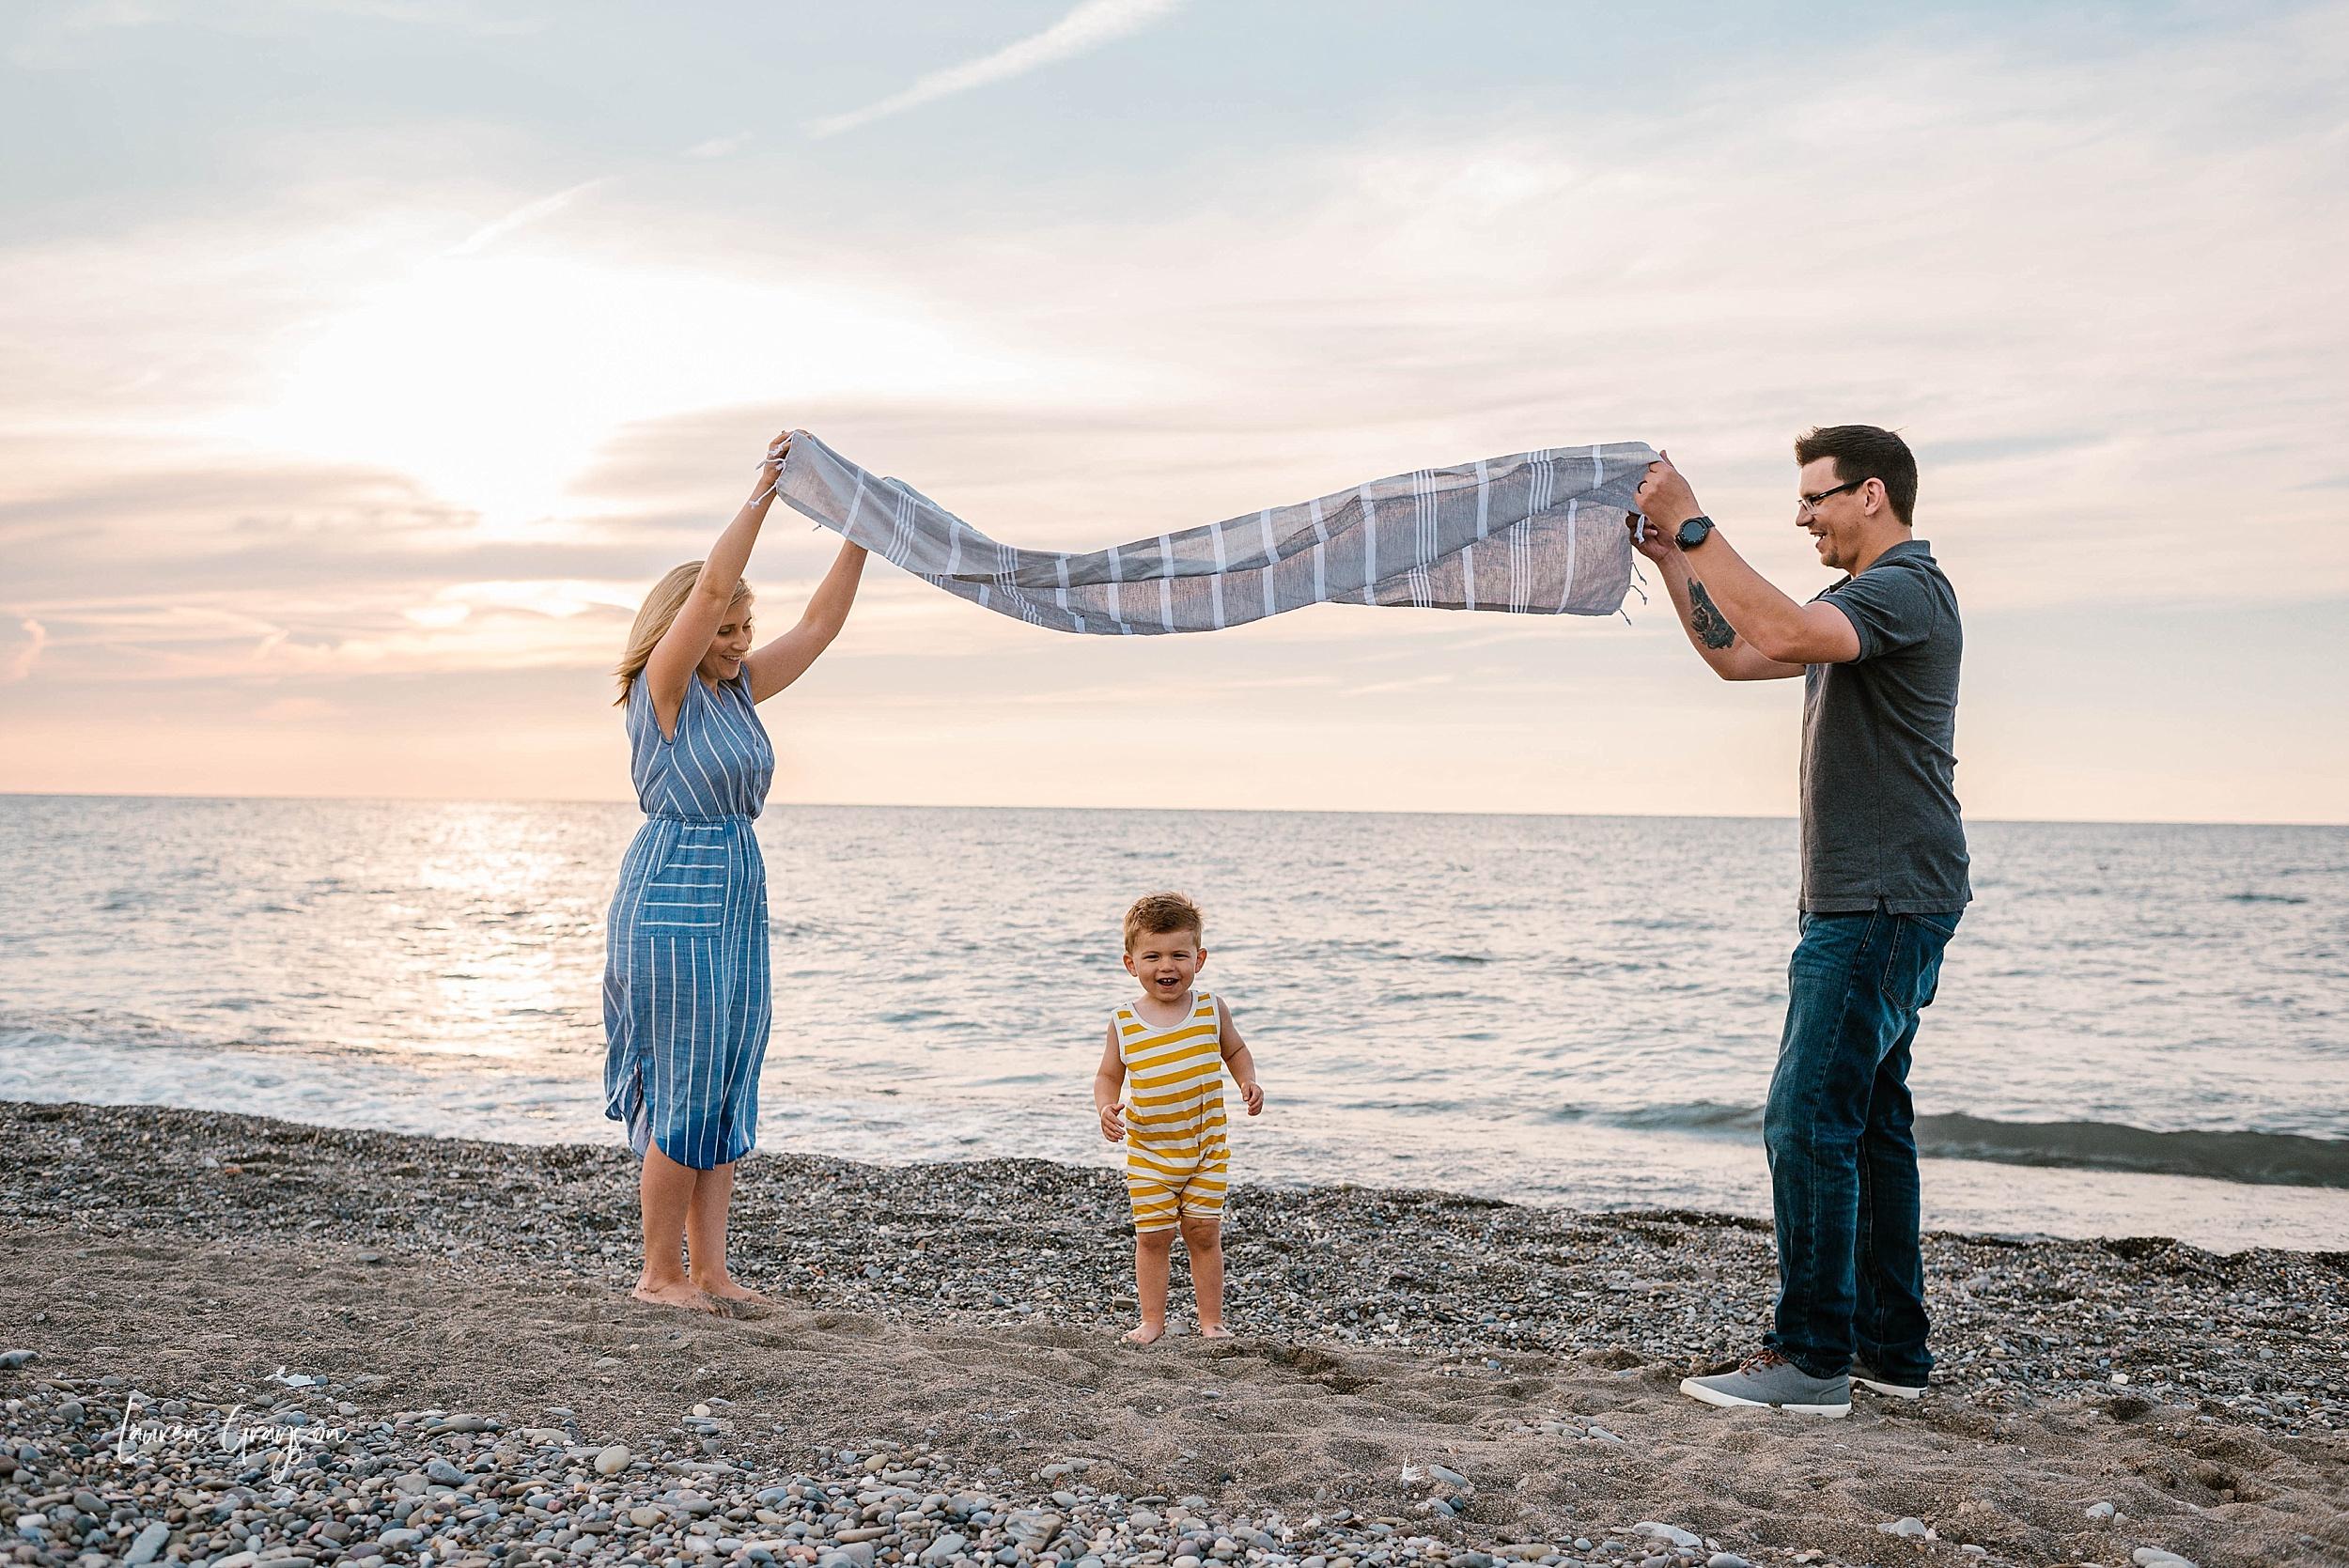 lauren-grayson-photography-cleveland-ohio-photographer-mentor-headlands-beach-maternity-session-2018_0770.jpg